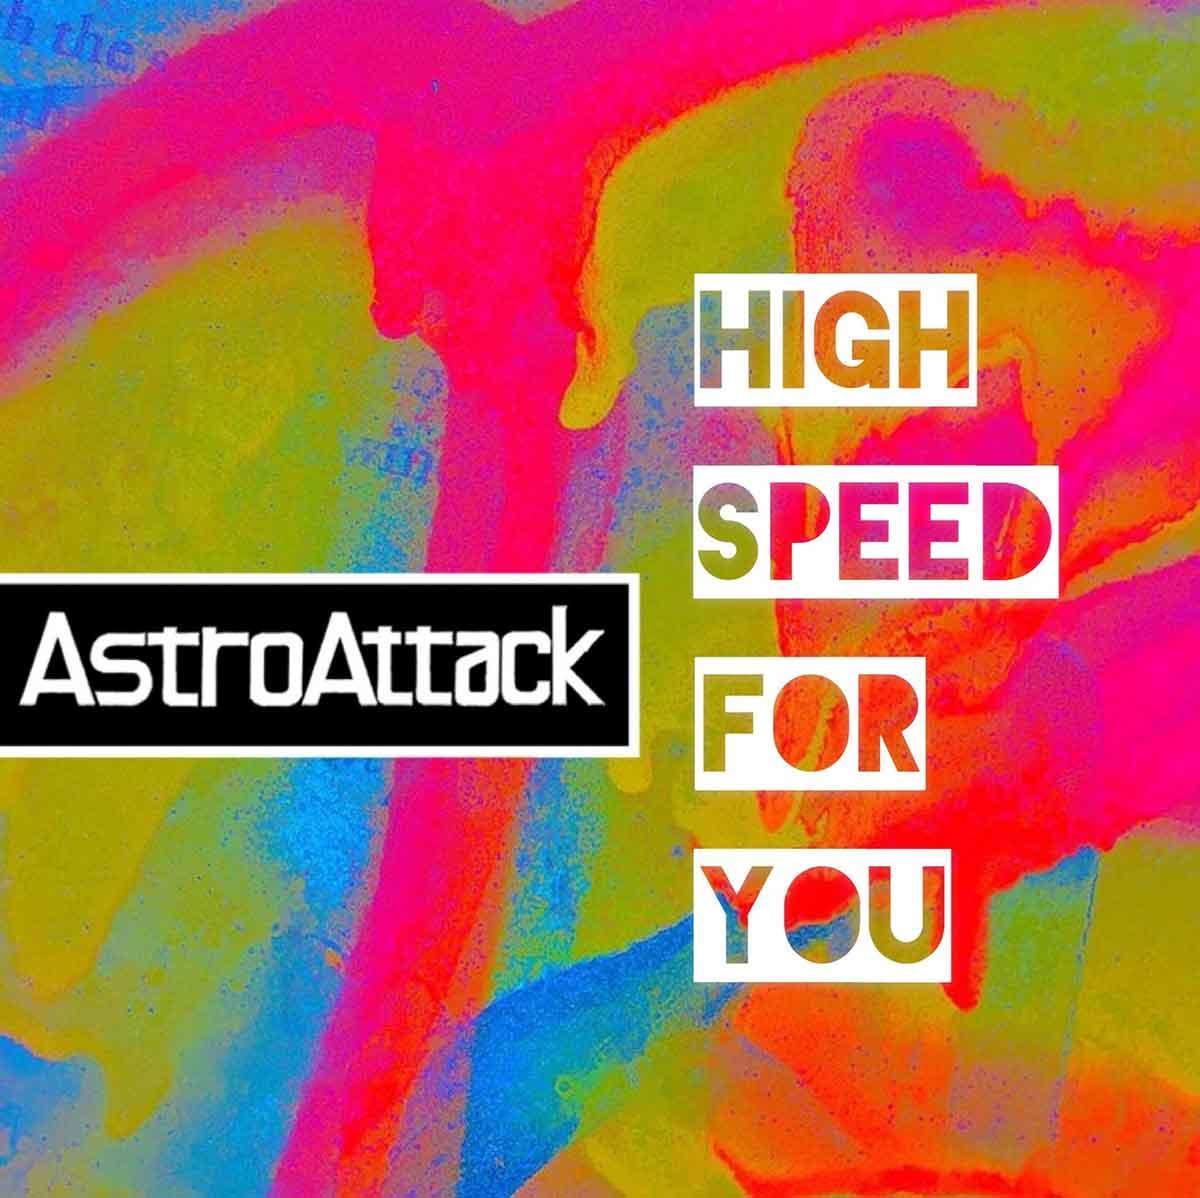 astroattack_jk_1200_20210113.jpg